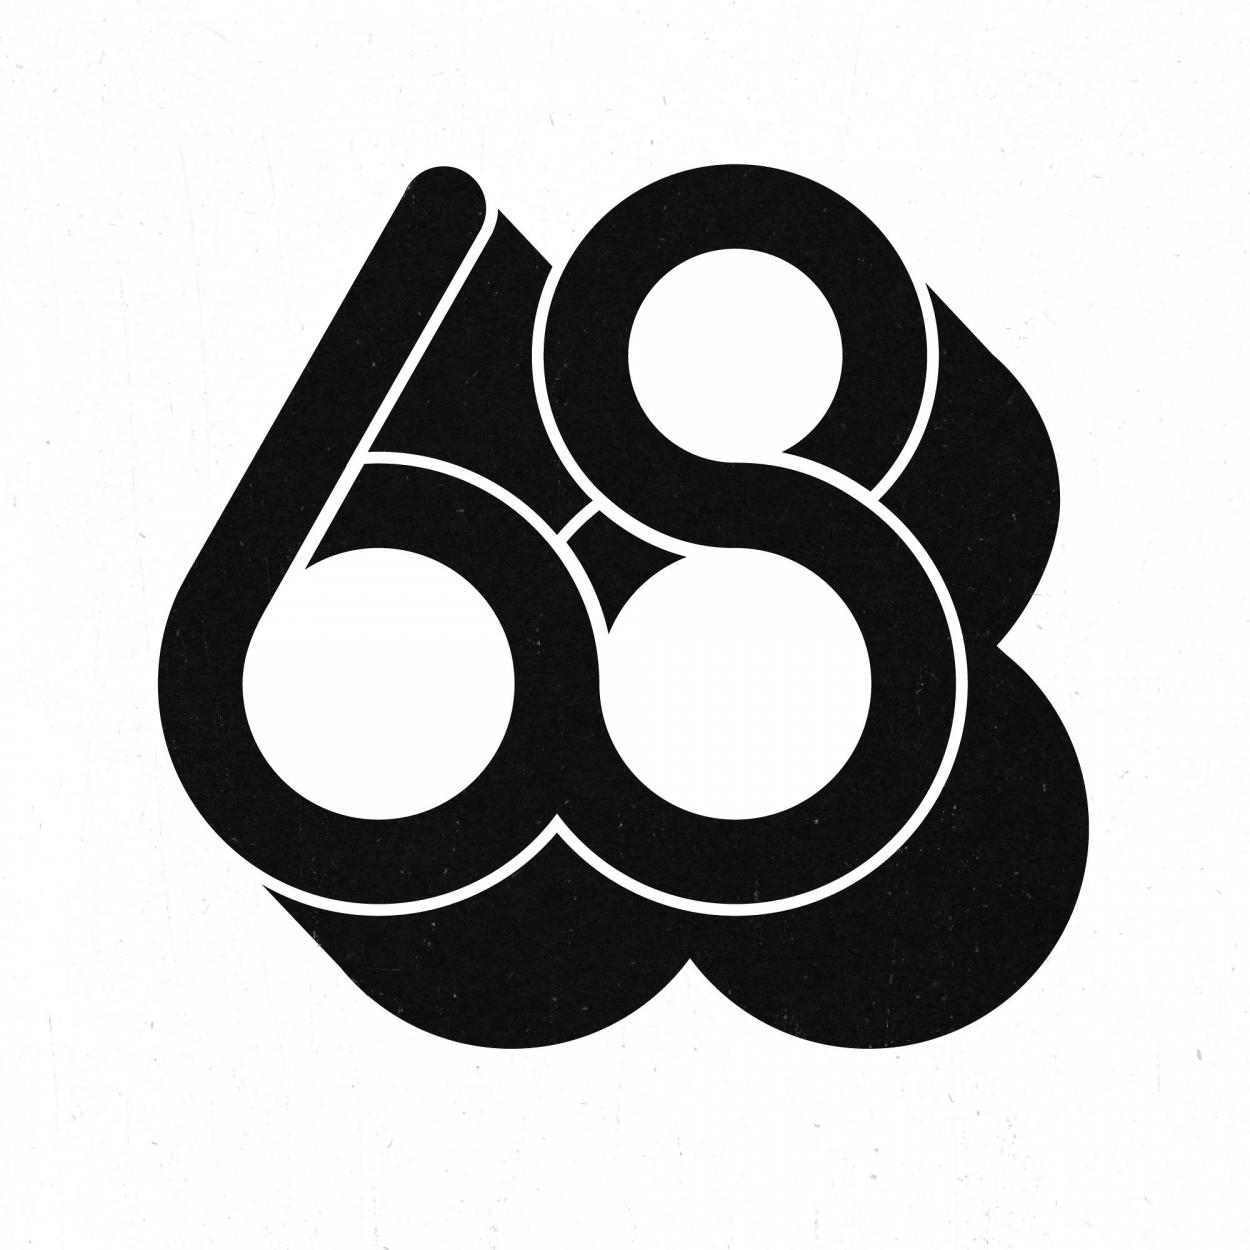 68 >> 68 Dr Odd